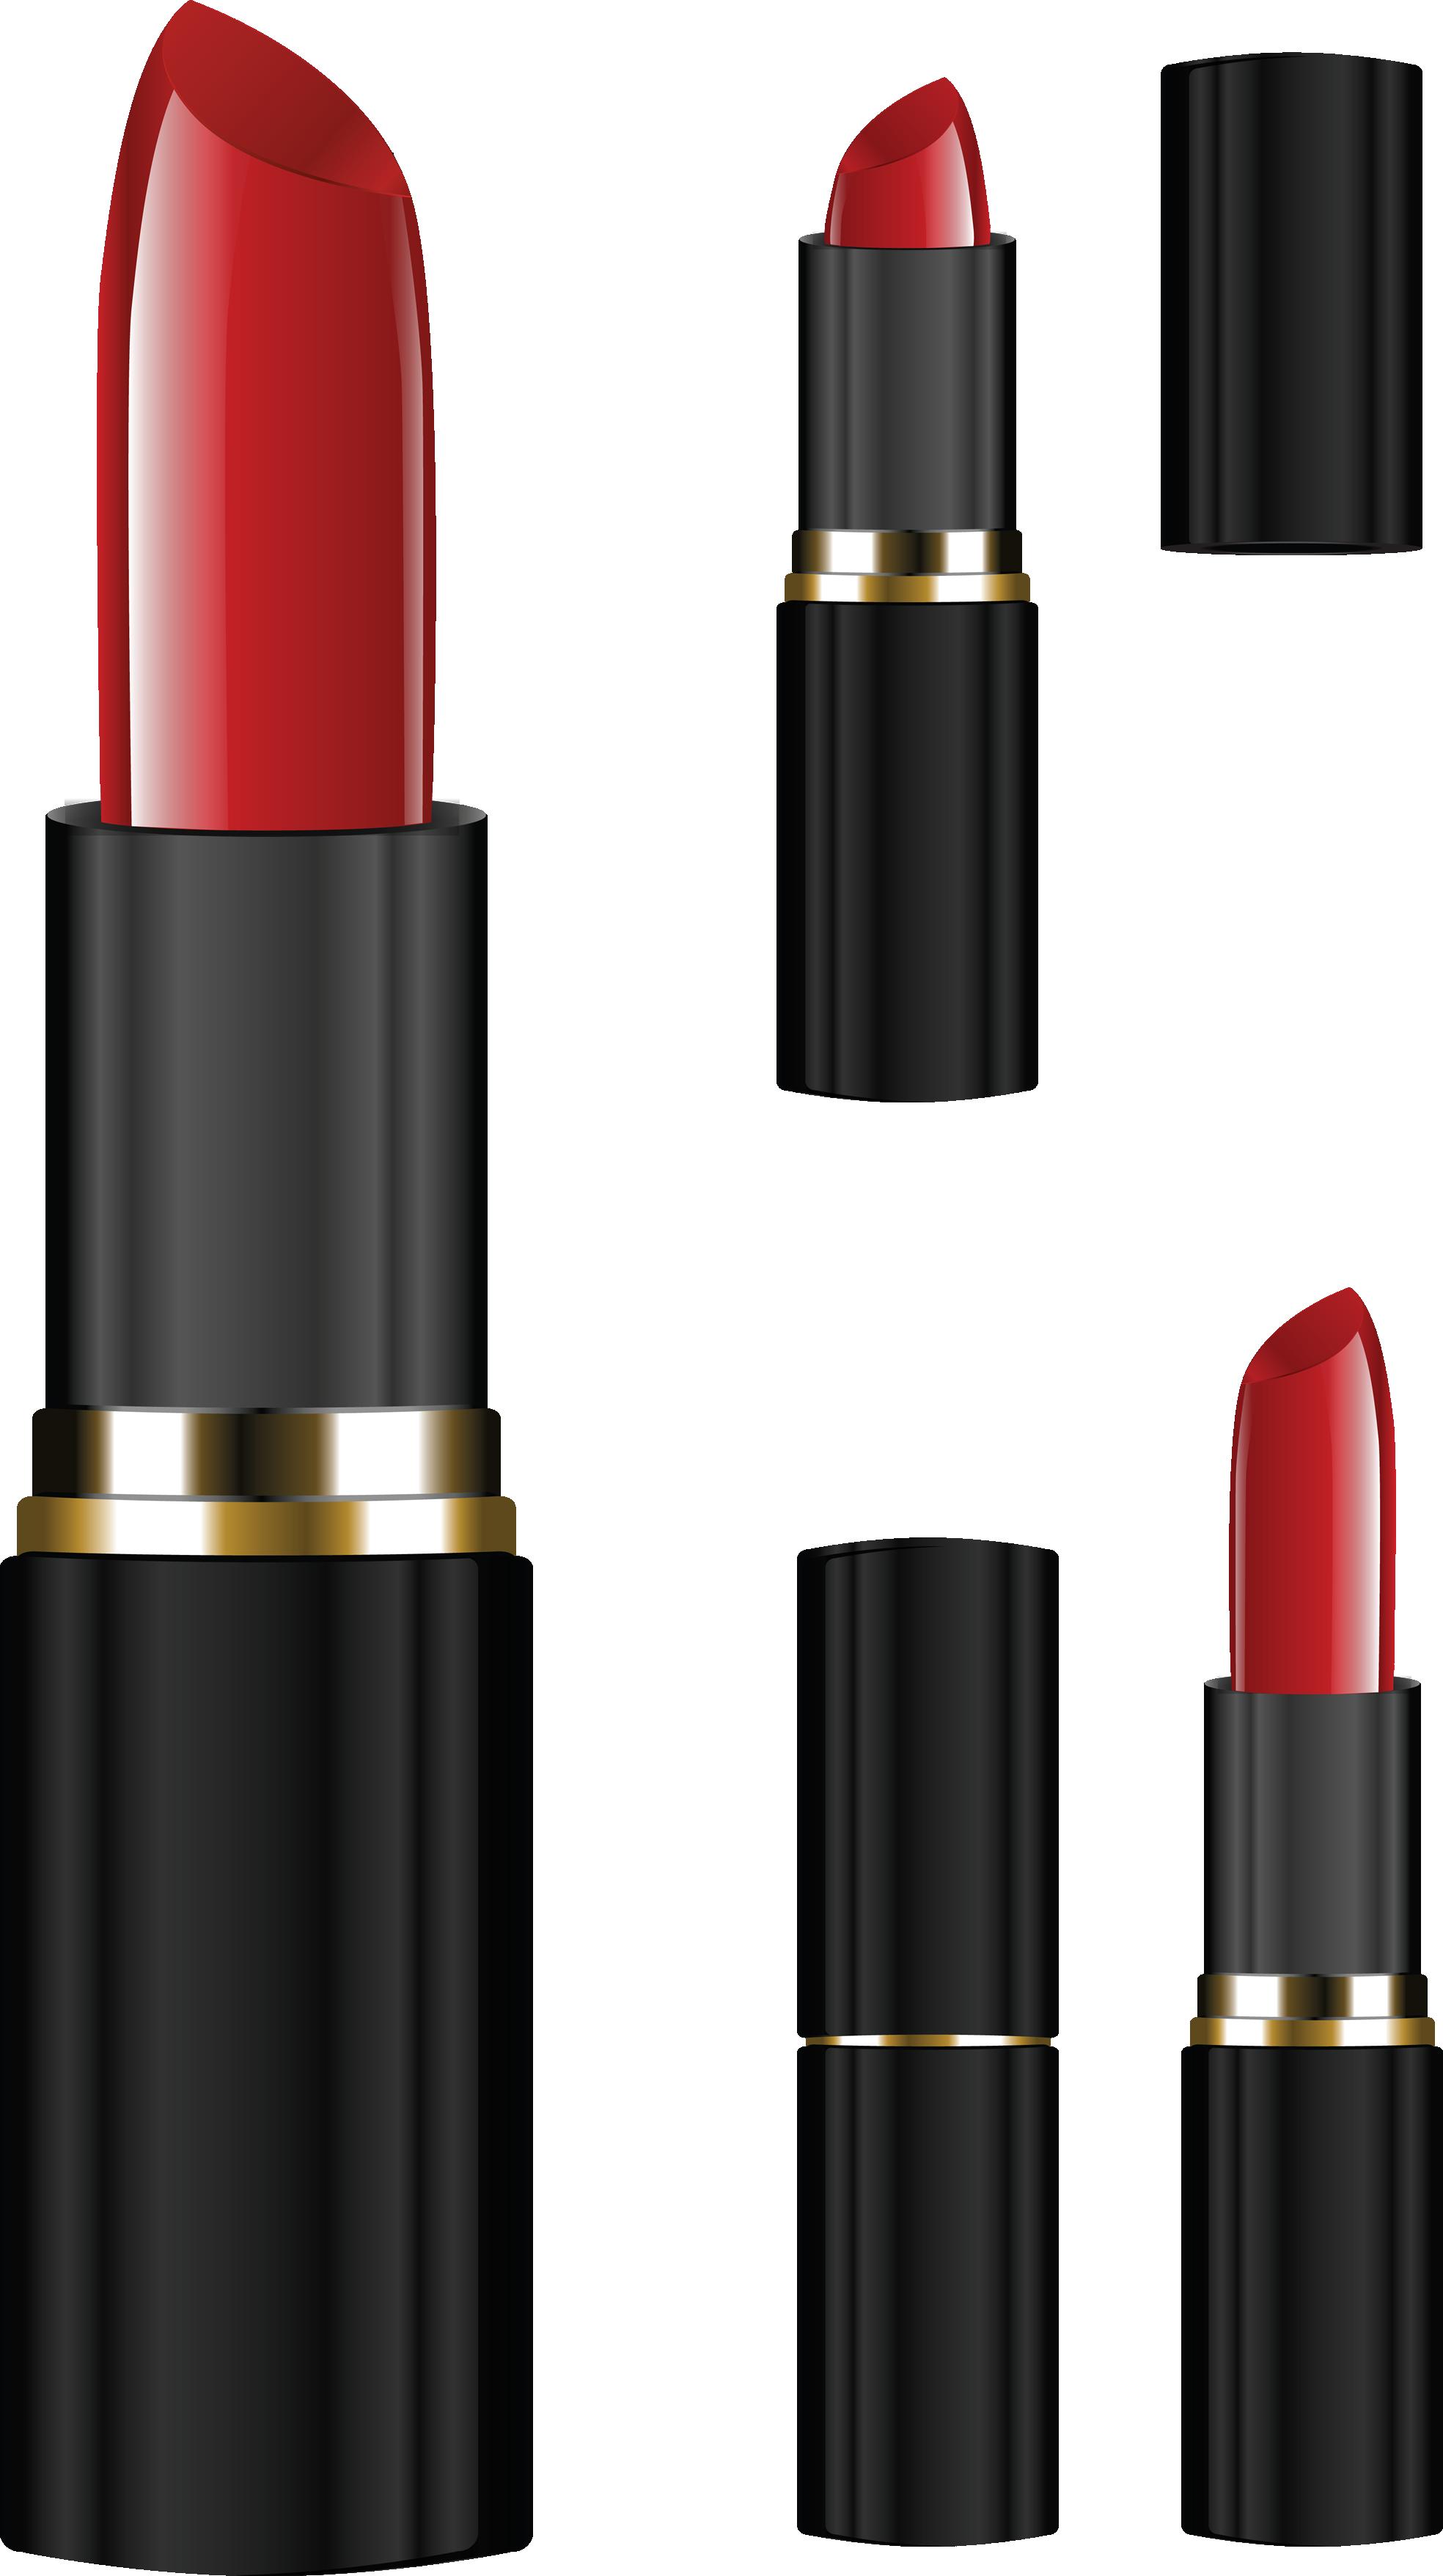 Mac Giambattista hot pink Lipstick Lipstick Pink 3 gm: Buy